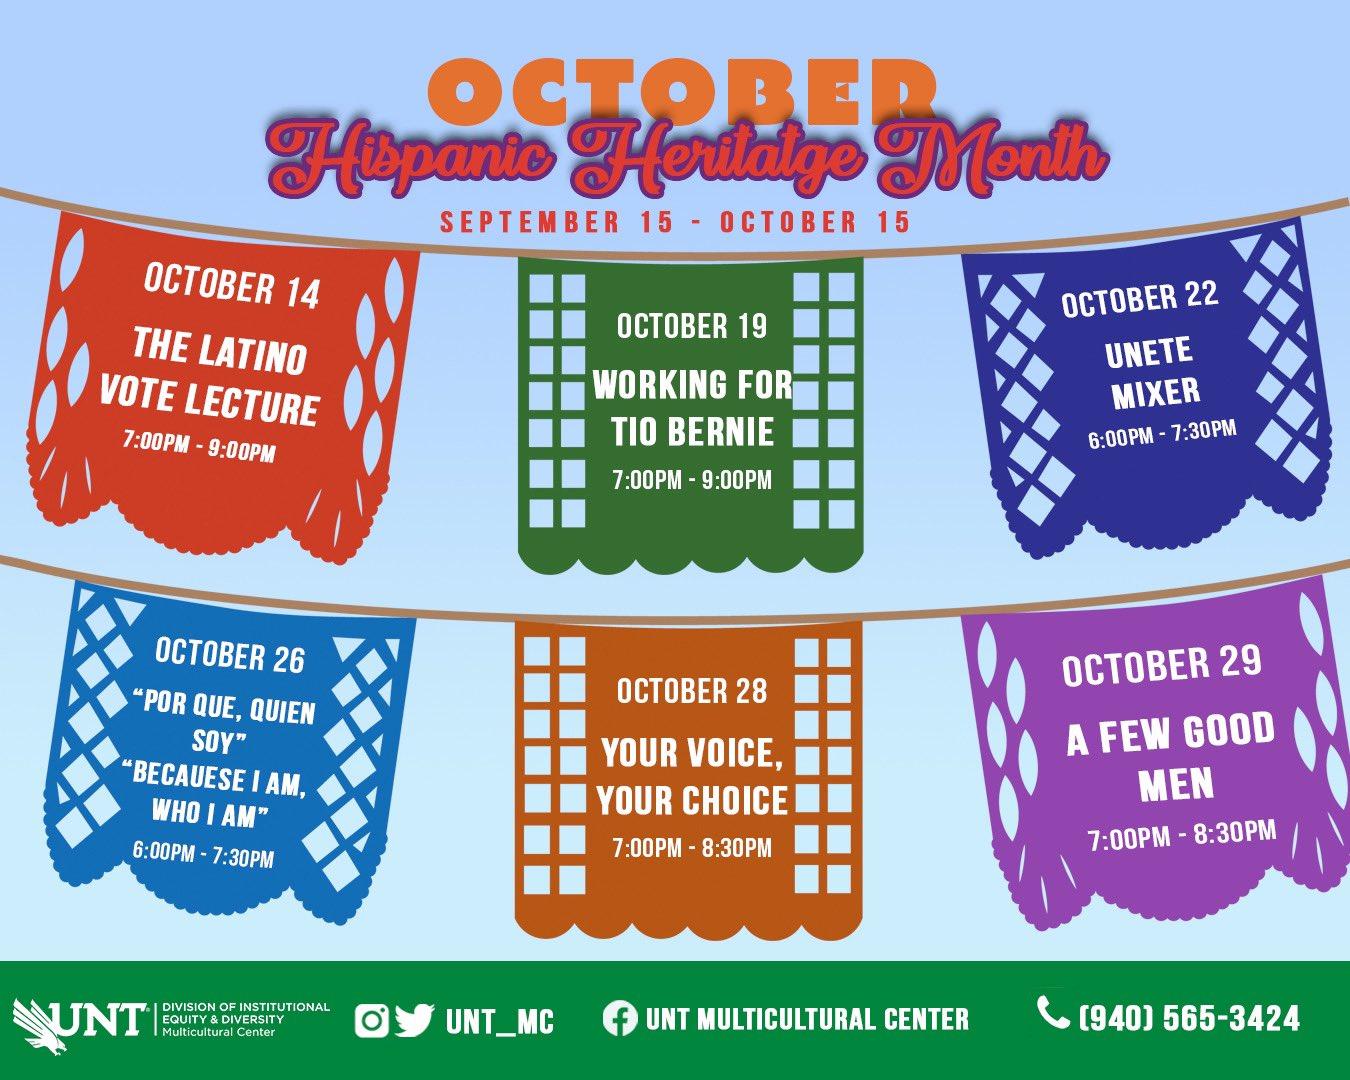 October events Multicultural Center calendar